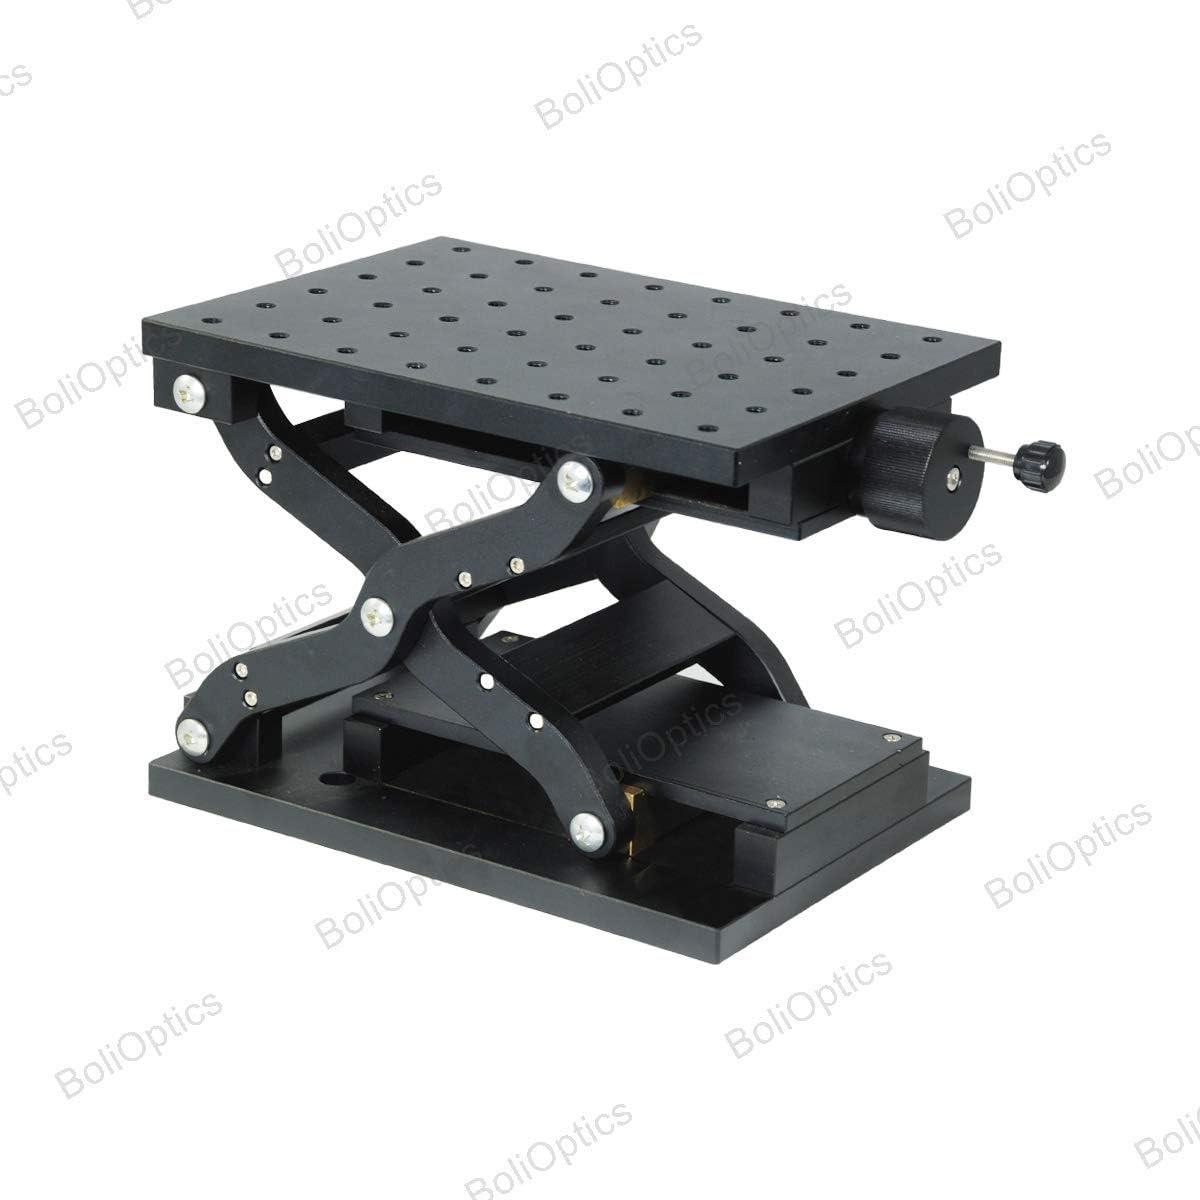 Bearing Tuning Sliding Platform BoliOptics XYZ Manual Lift Z-Axis Microscope Stage Travel Translation Mechanical Stage SG02201211